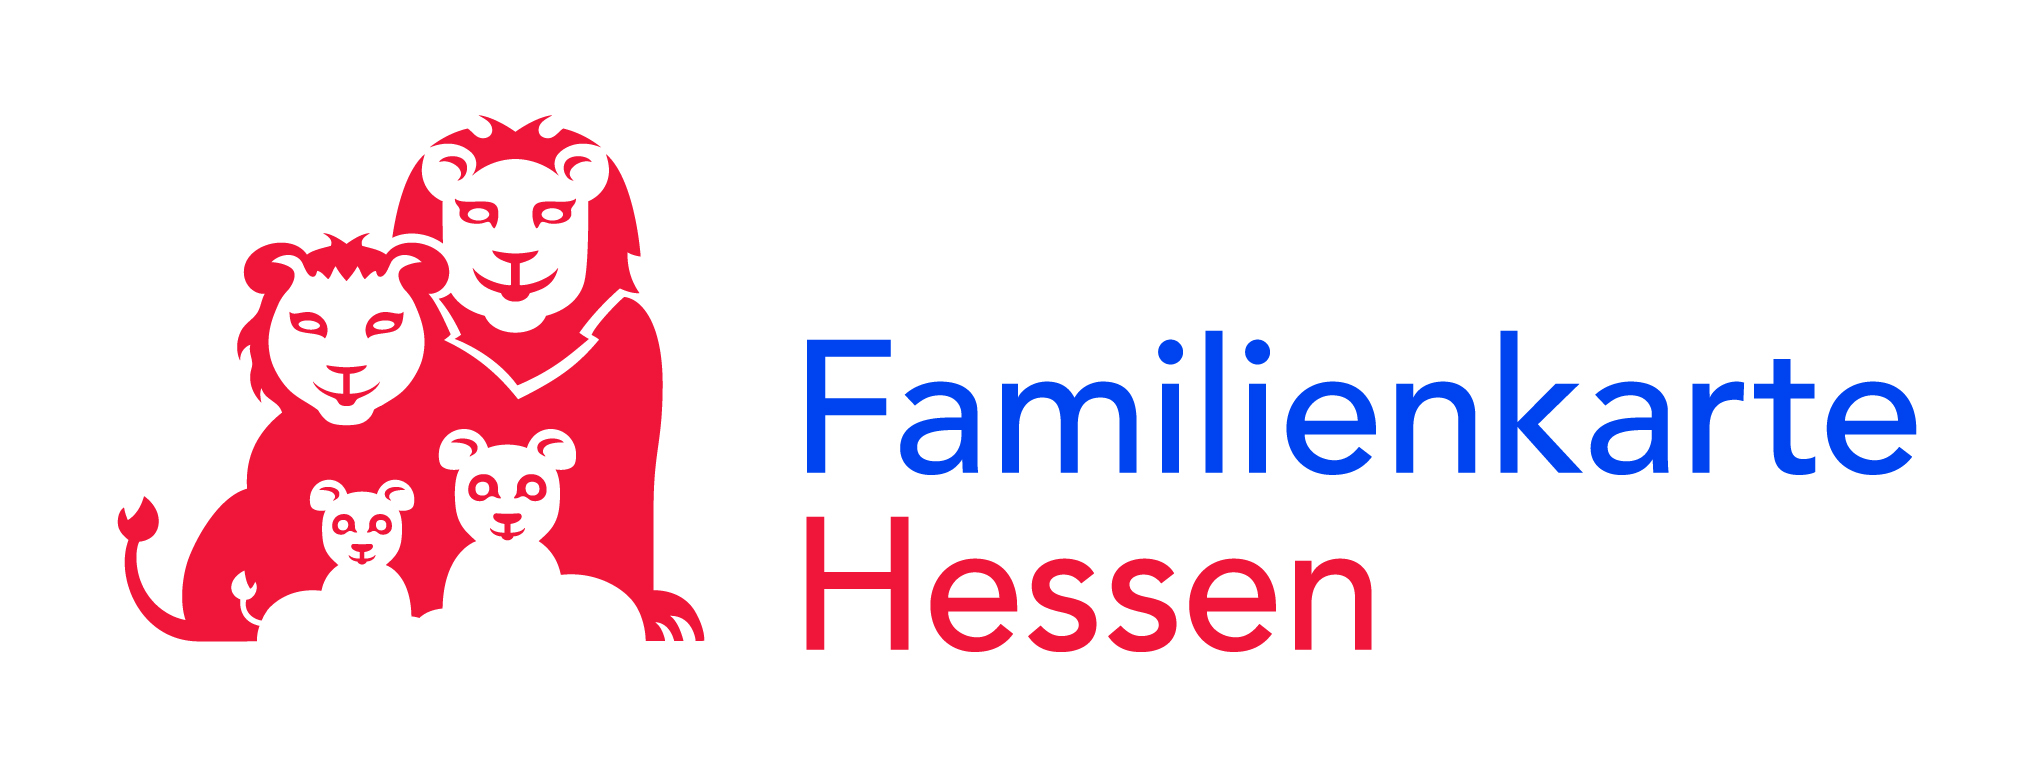 RZ_01_Logo_HF_4C.indd